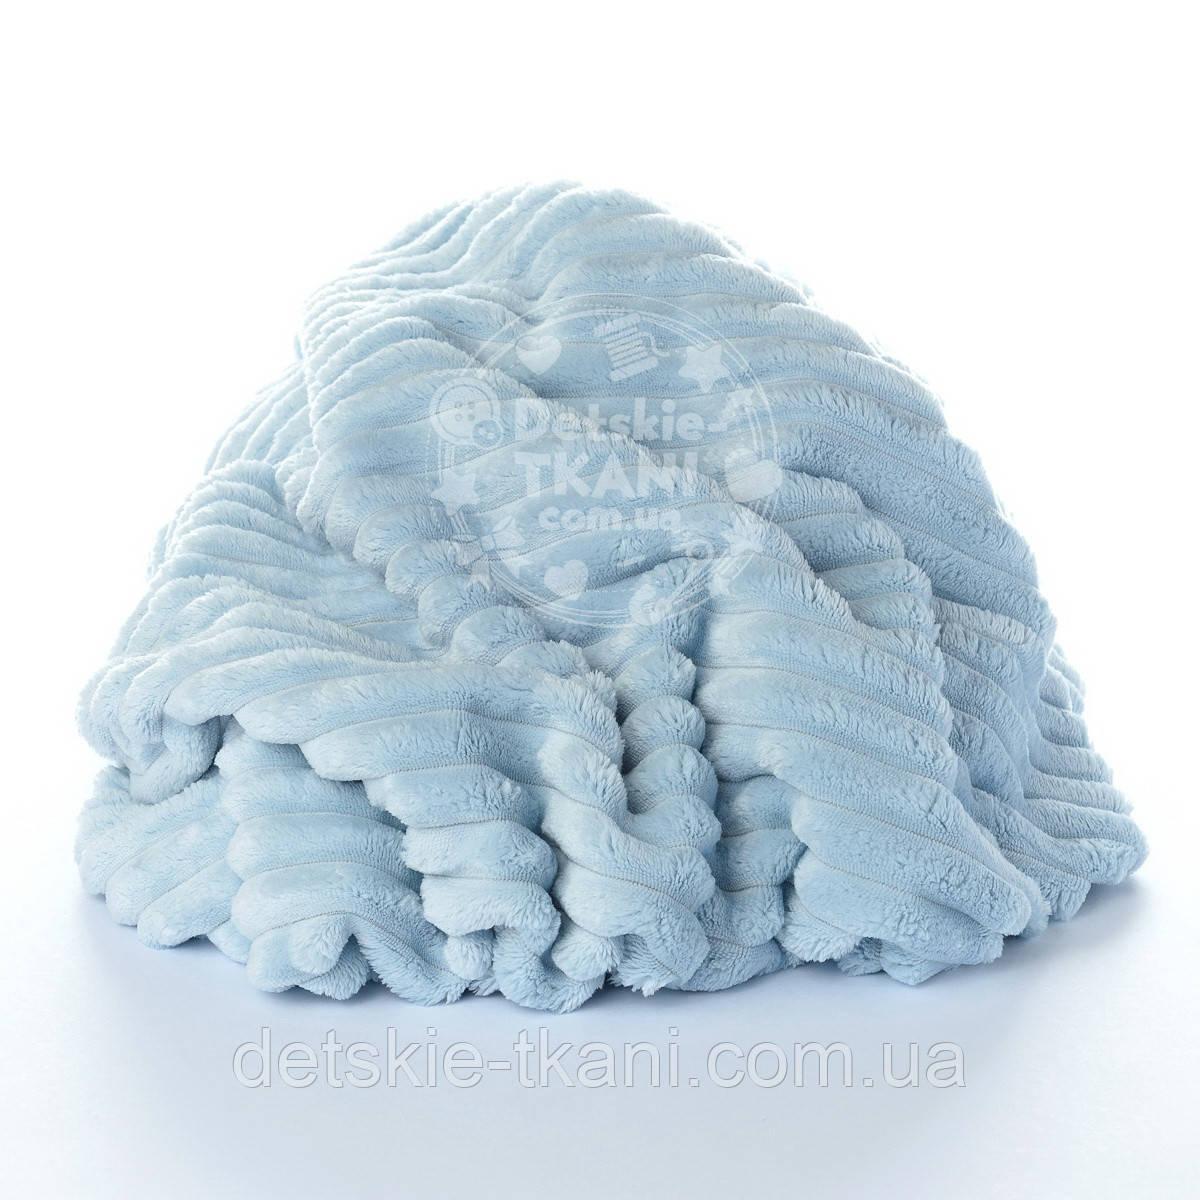 Плюш в полоску stripes бледно-голубого цвета